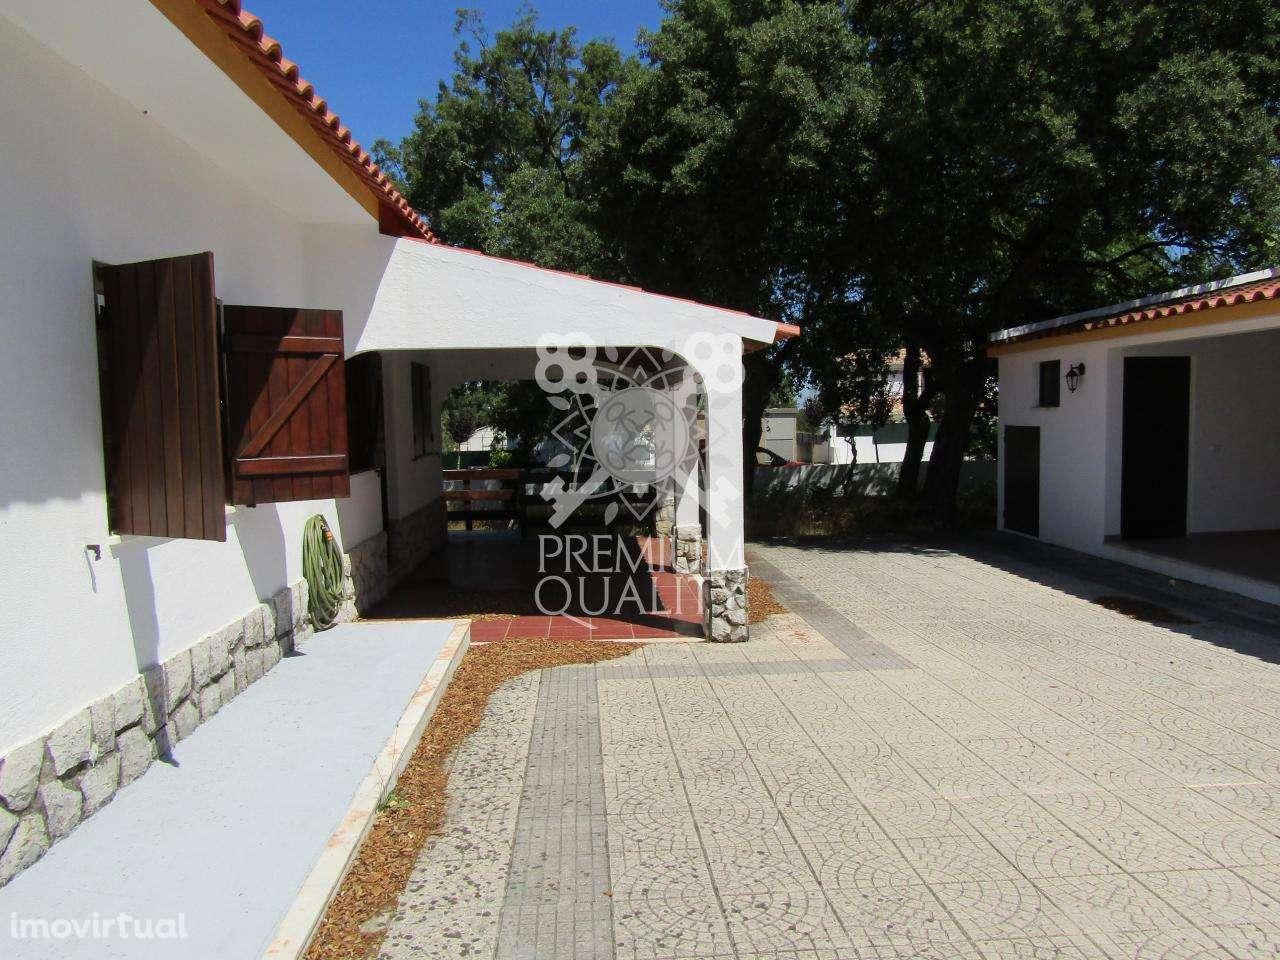 Moradia para comprar, Castelo (Sesimbra), Sesimbra, Setúbal - Foto 19